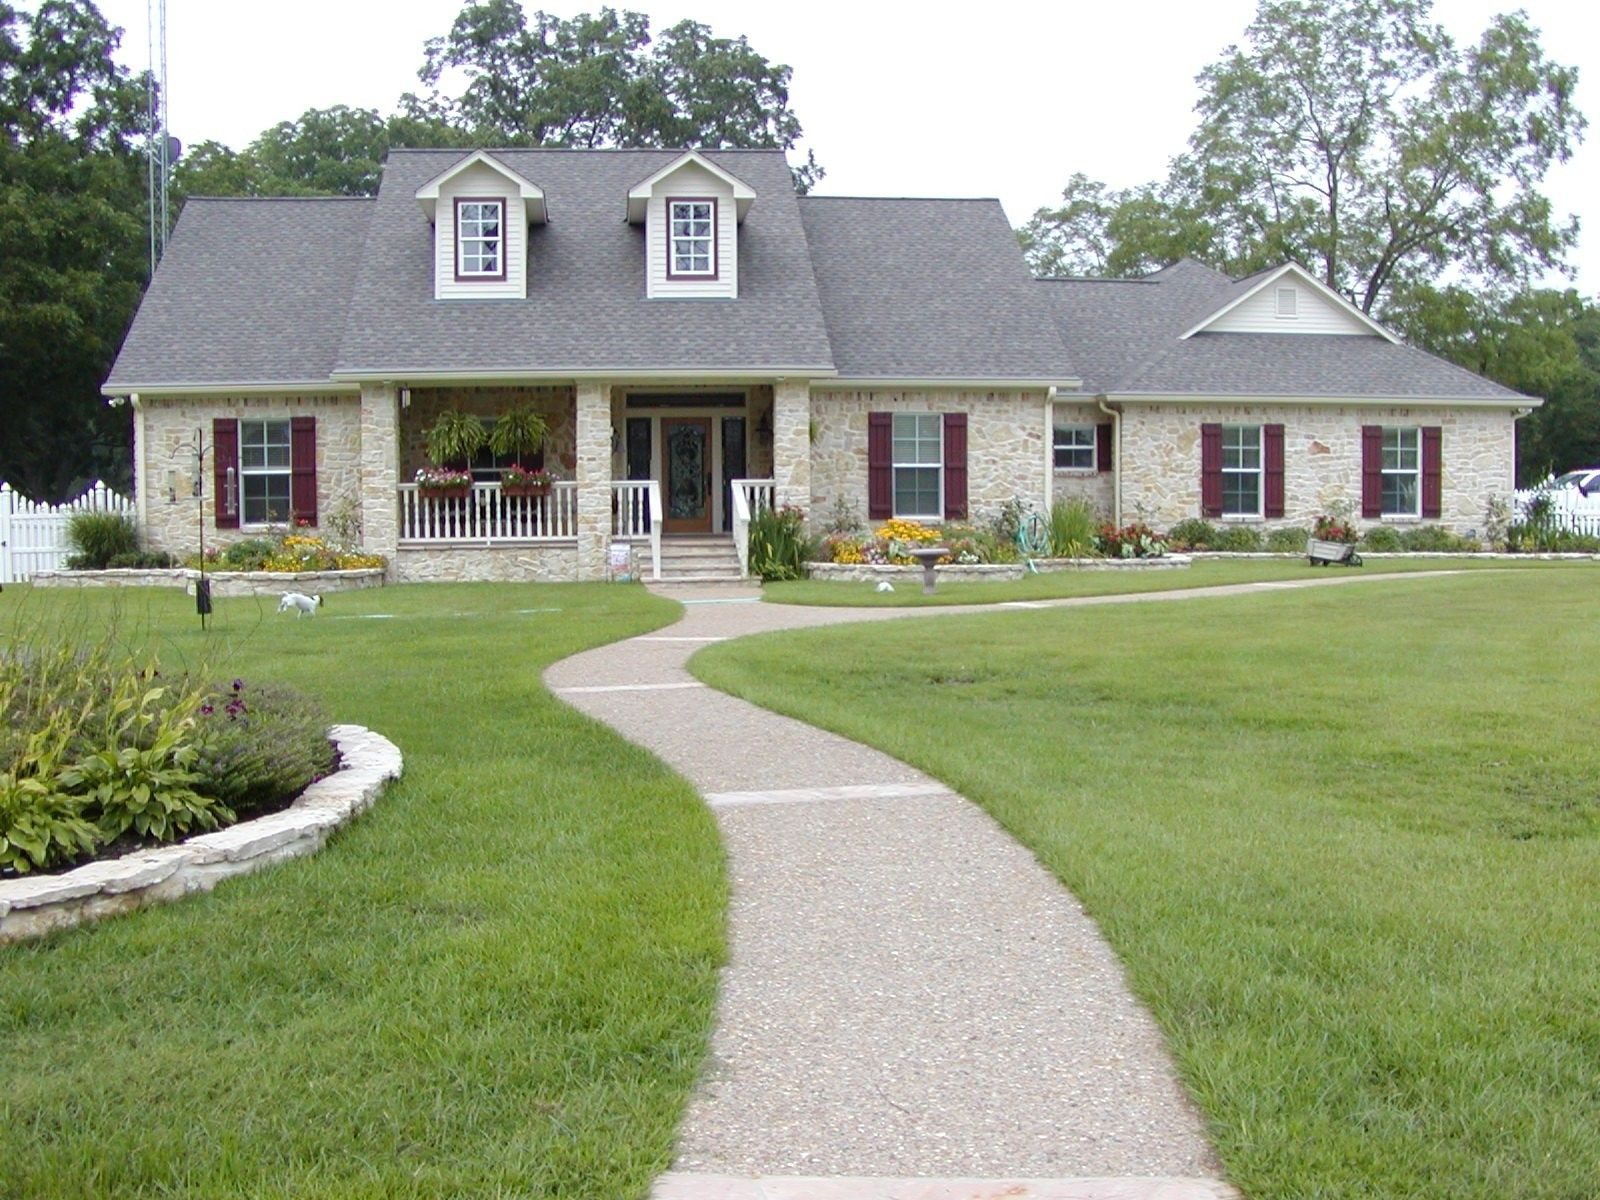 House AUSTIN STONE HOME PLANS